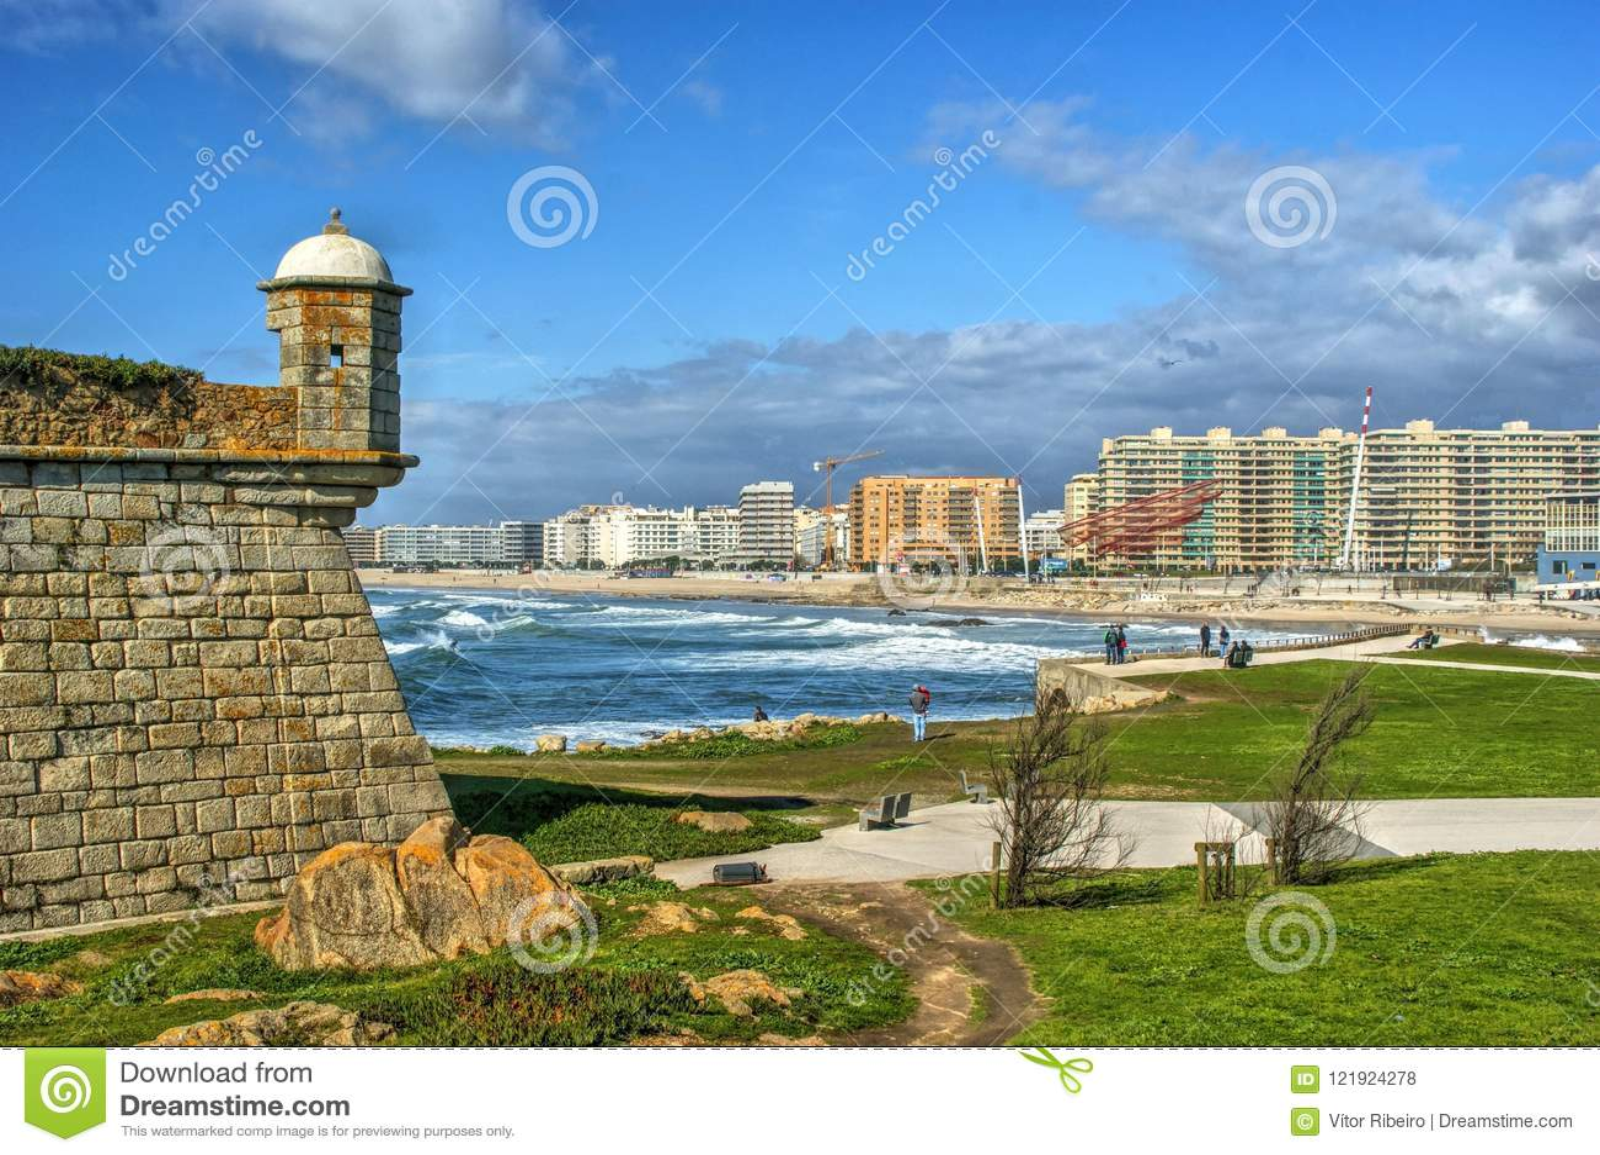 Fortress overlooking the coast of the Atlantic Ocean